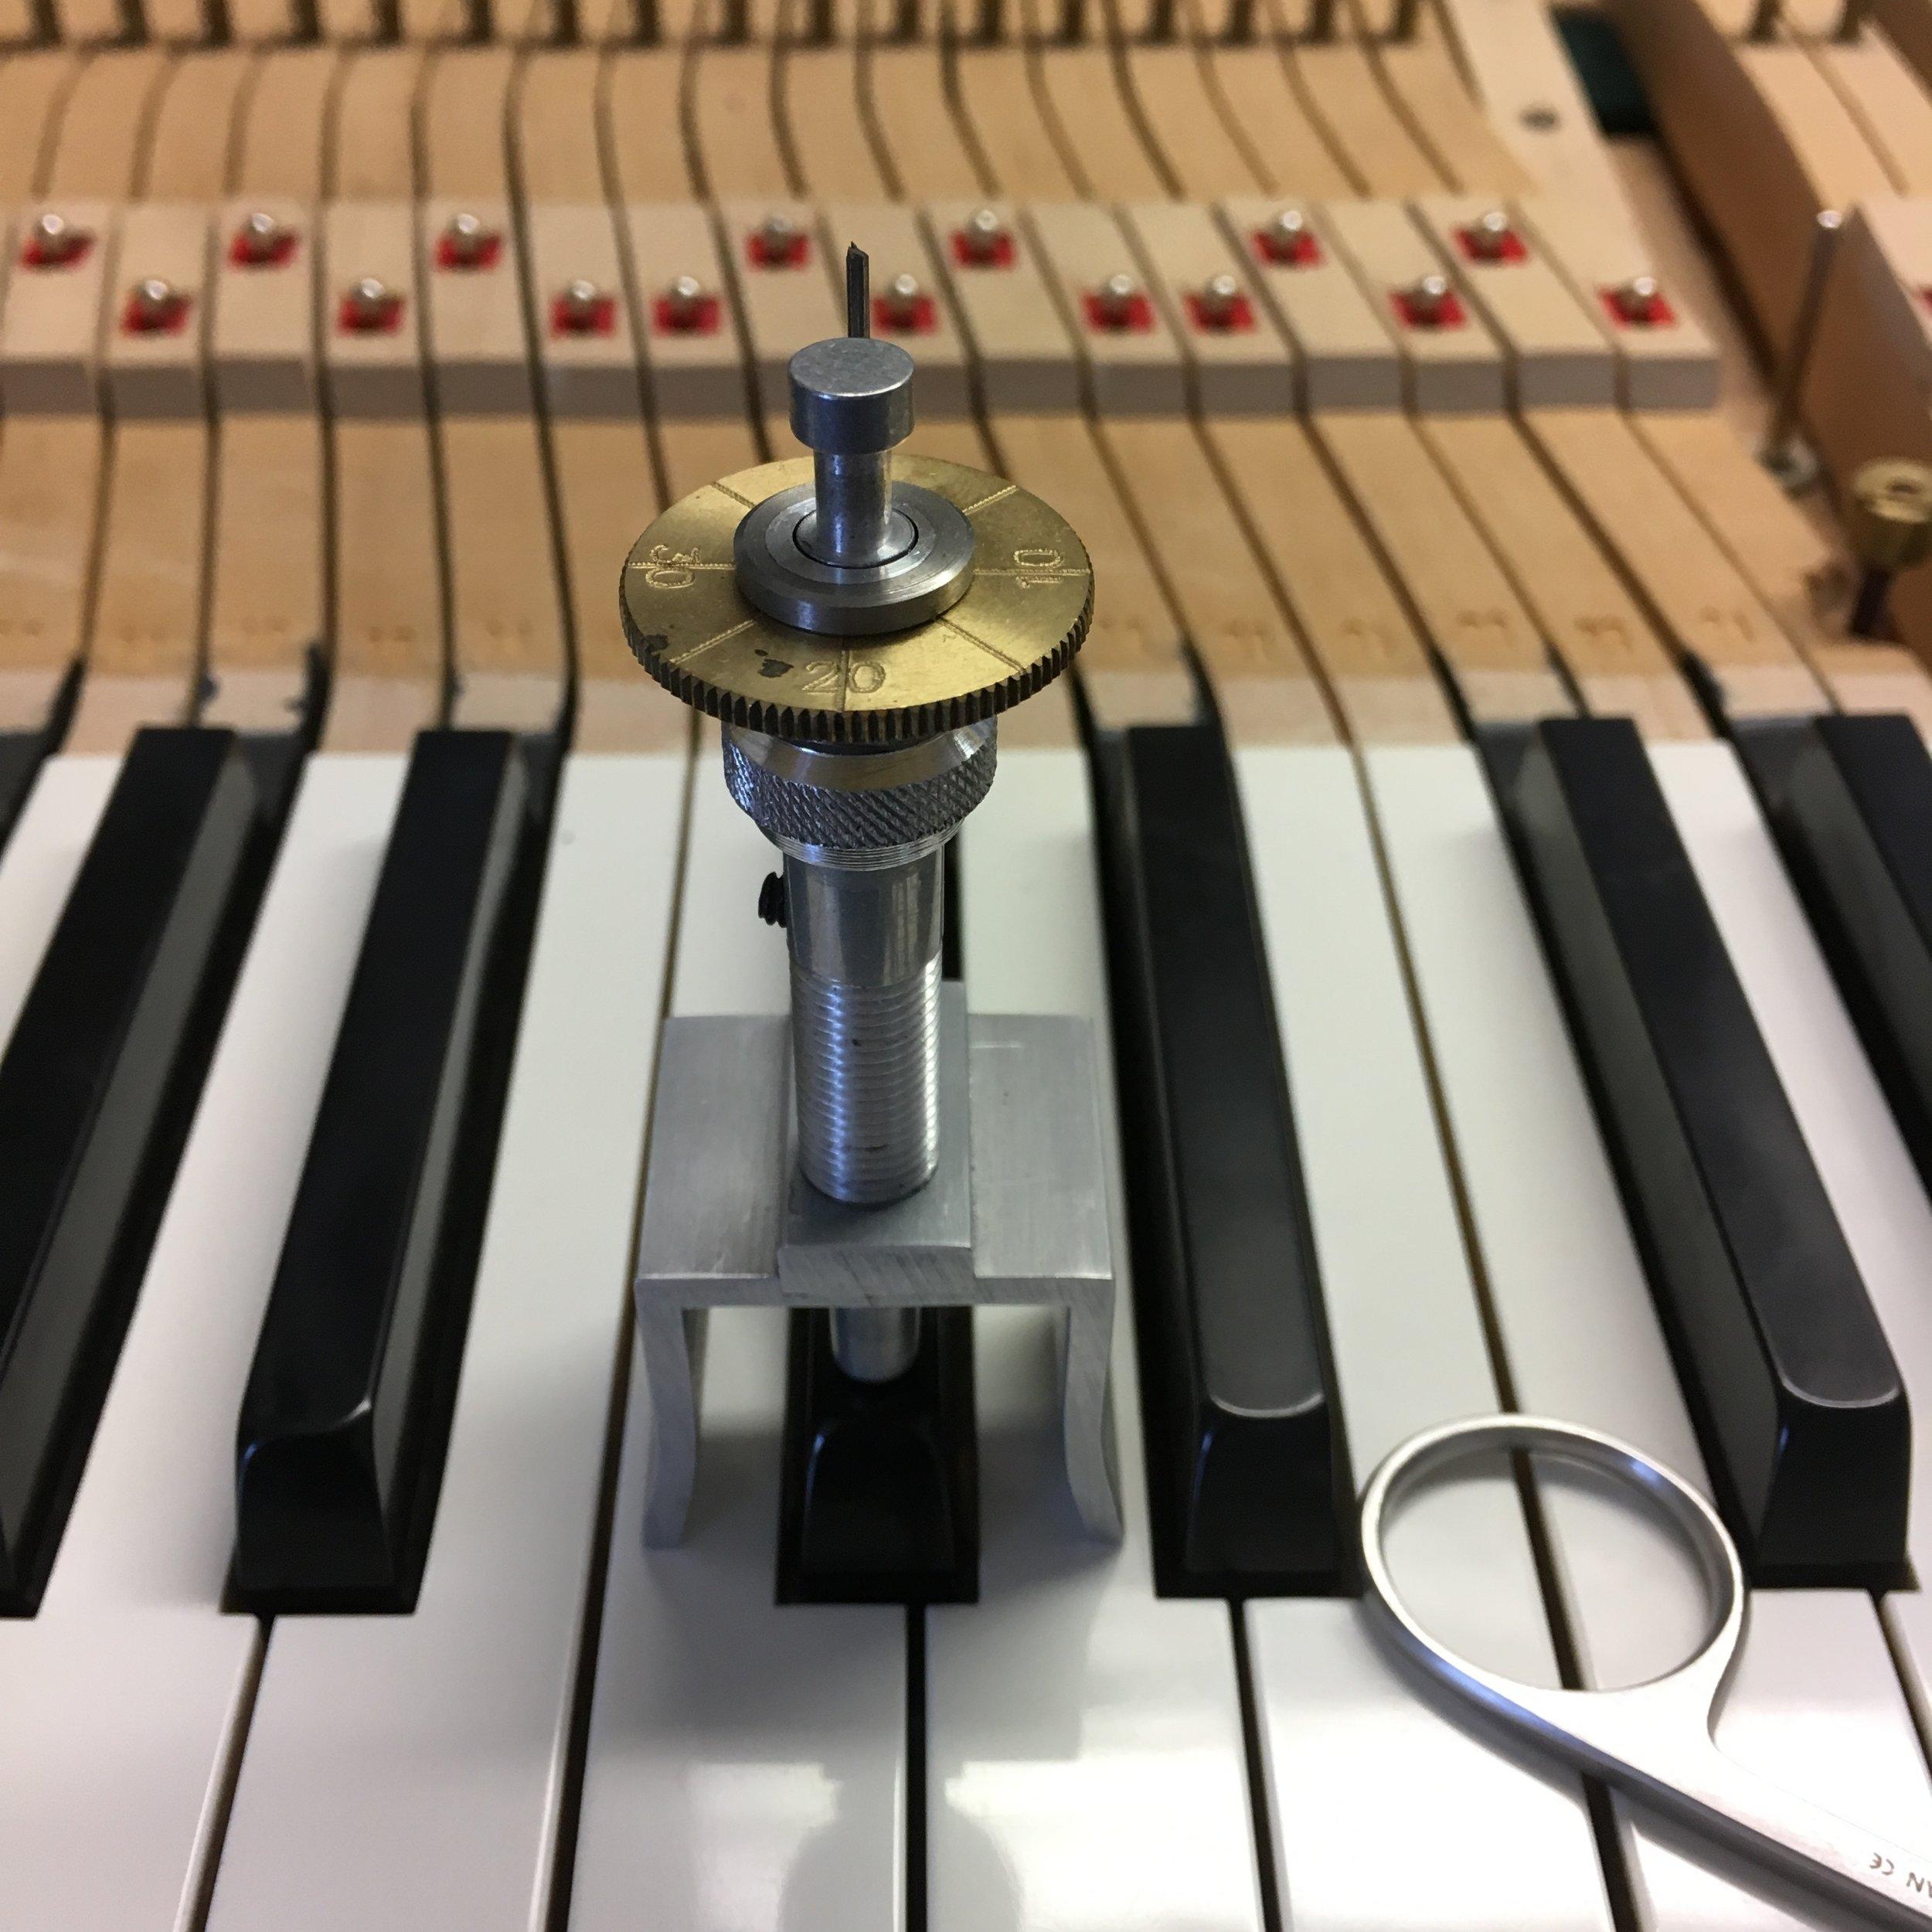 Leveling black piano keys.